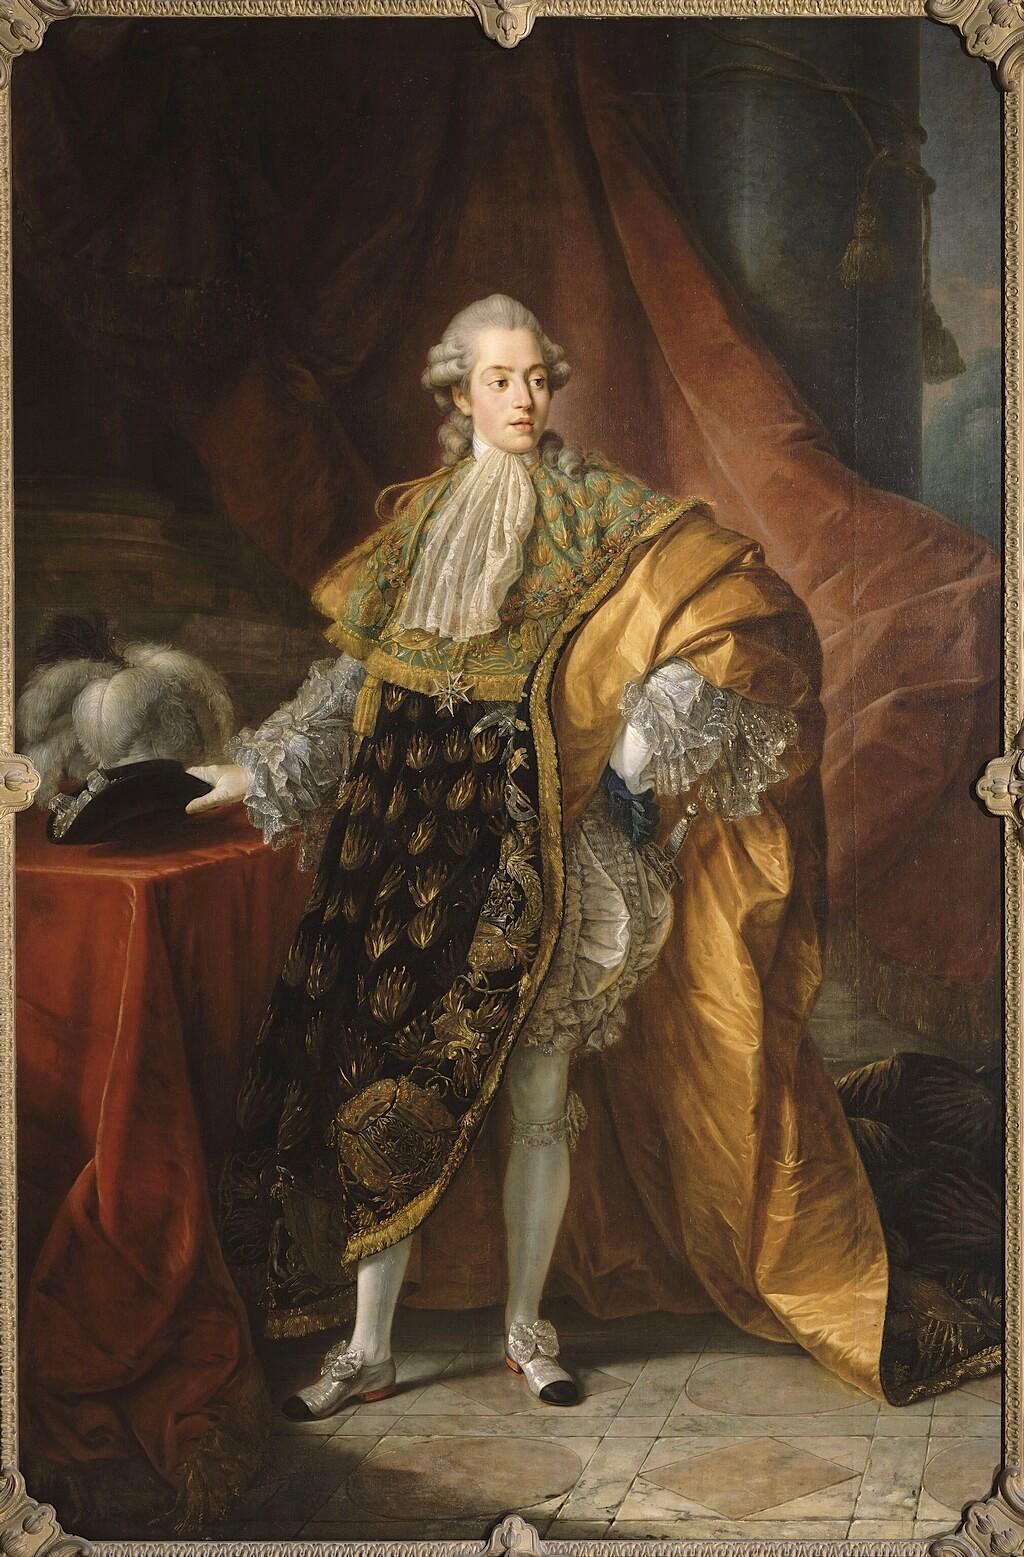 Le comte Charles-Philippe d'Artois, futur Charles X - Page 4 Image254